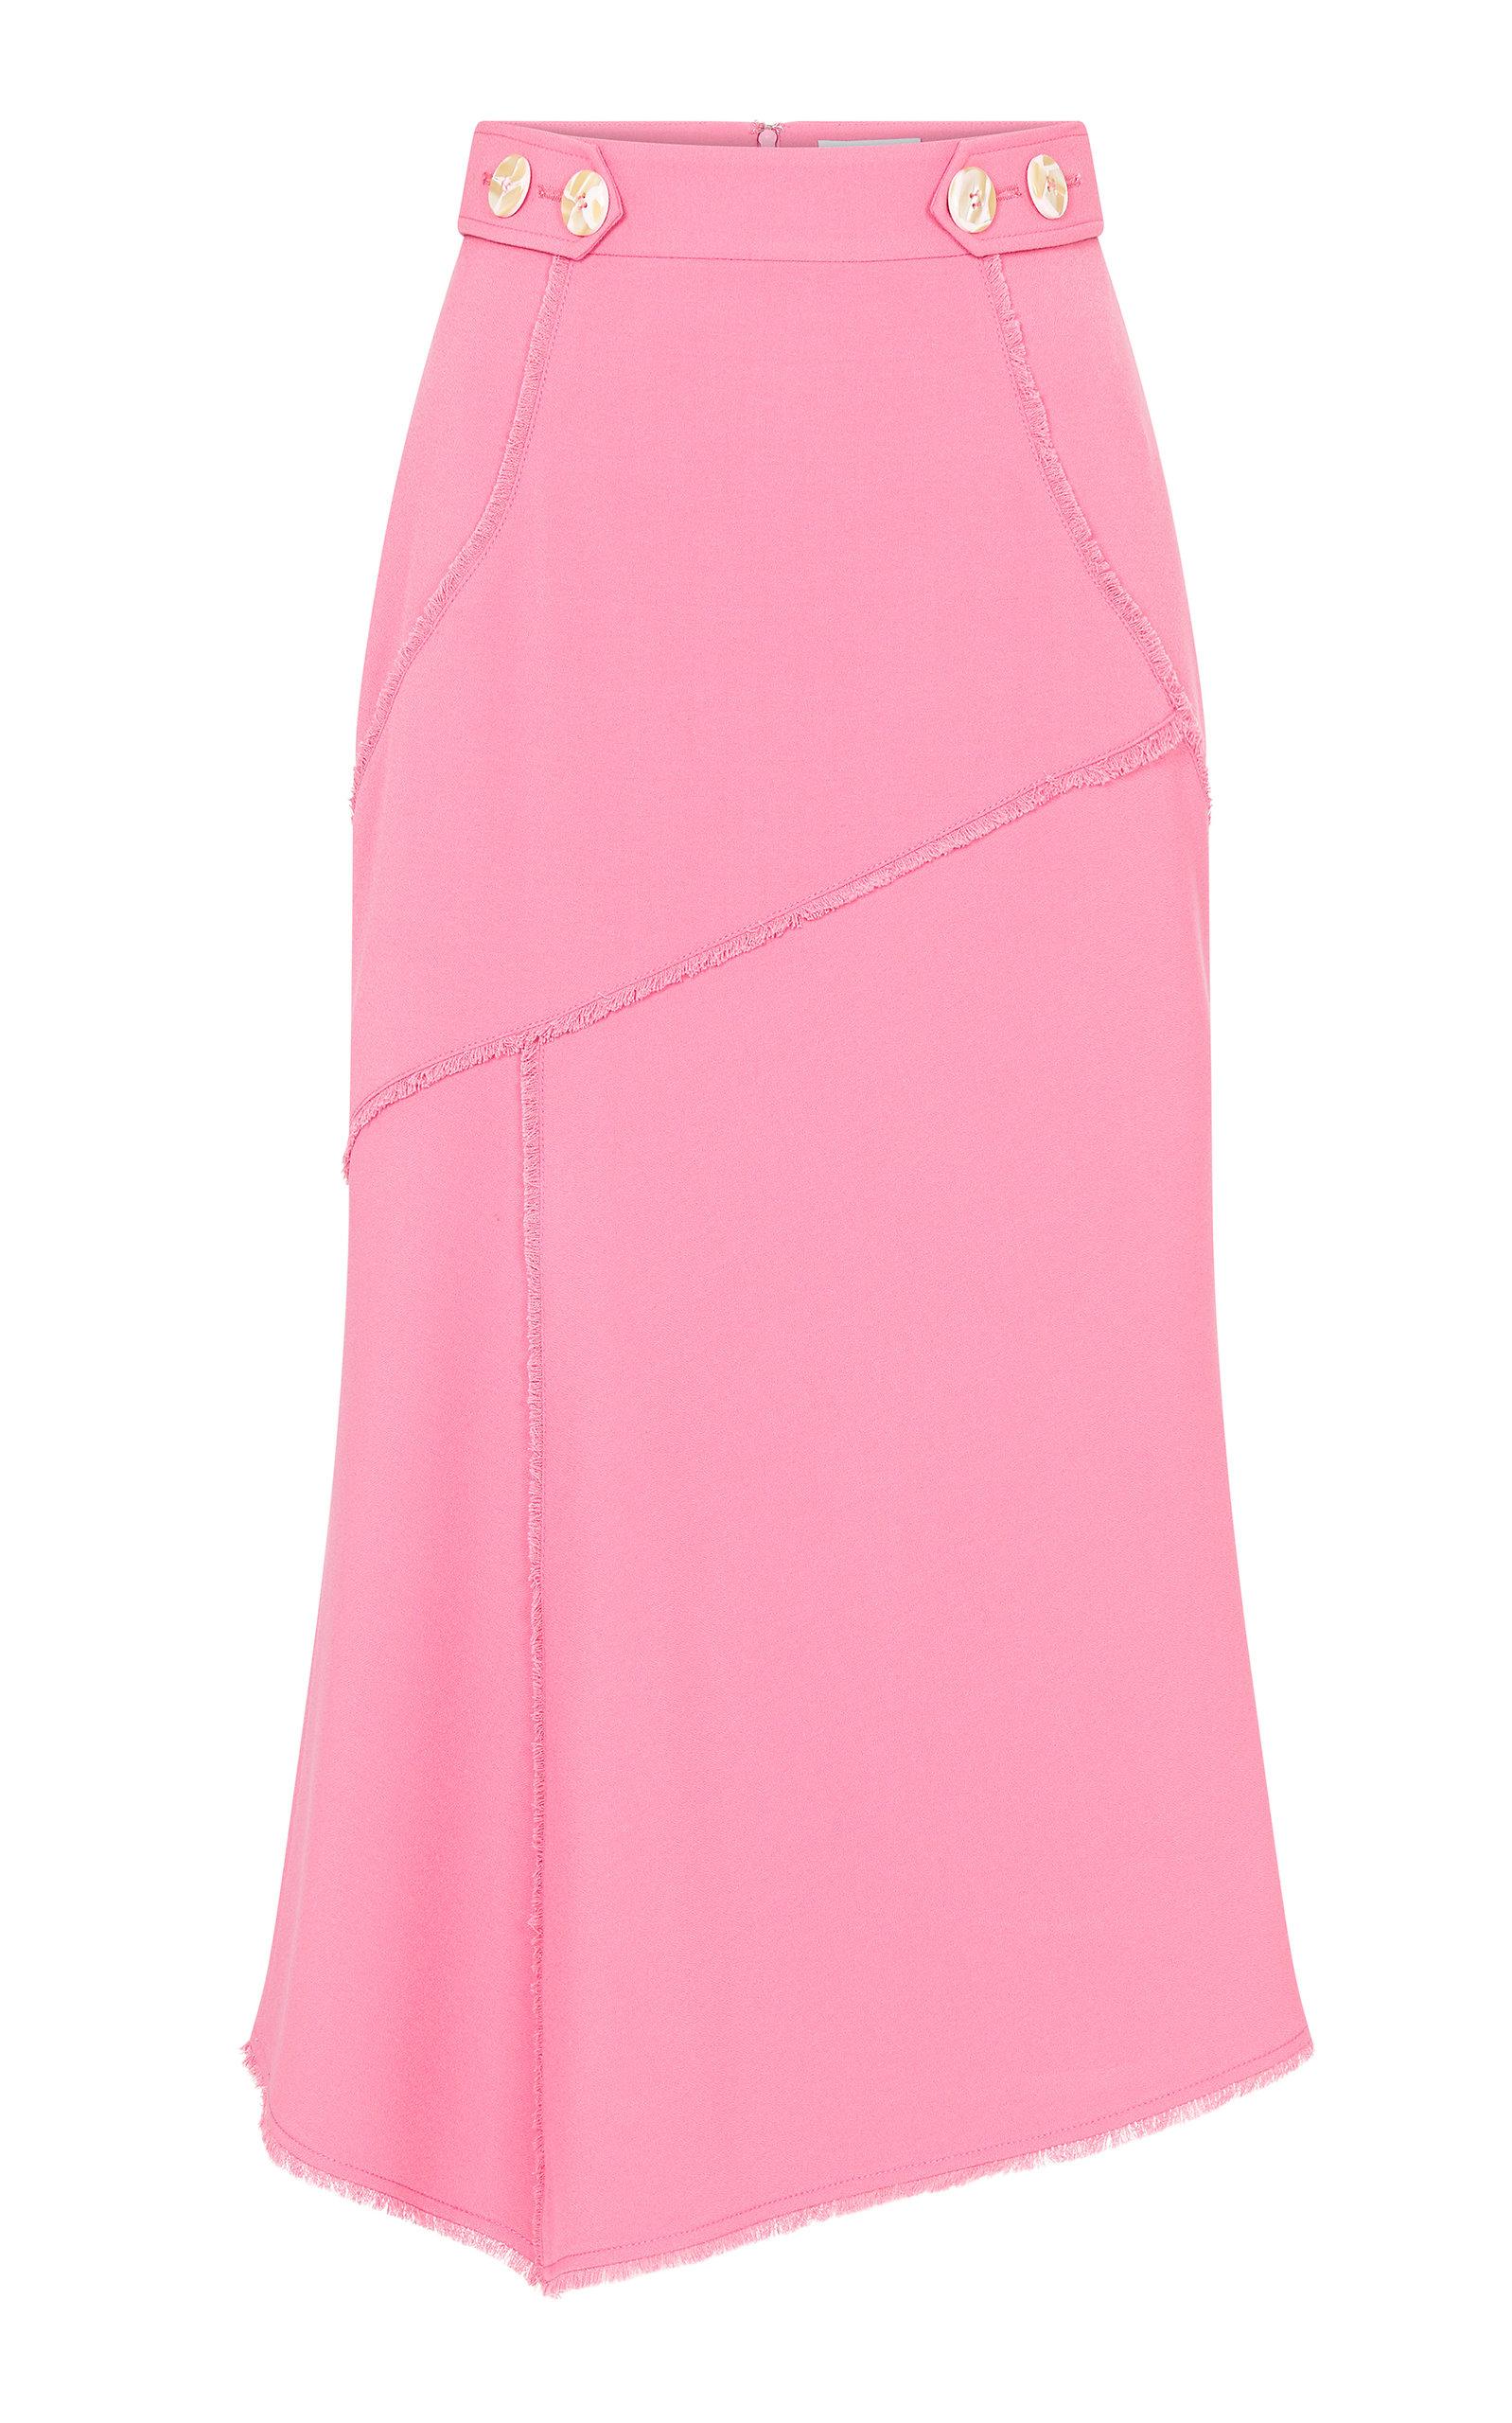 Sienna Panel Skirt